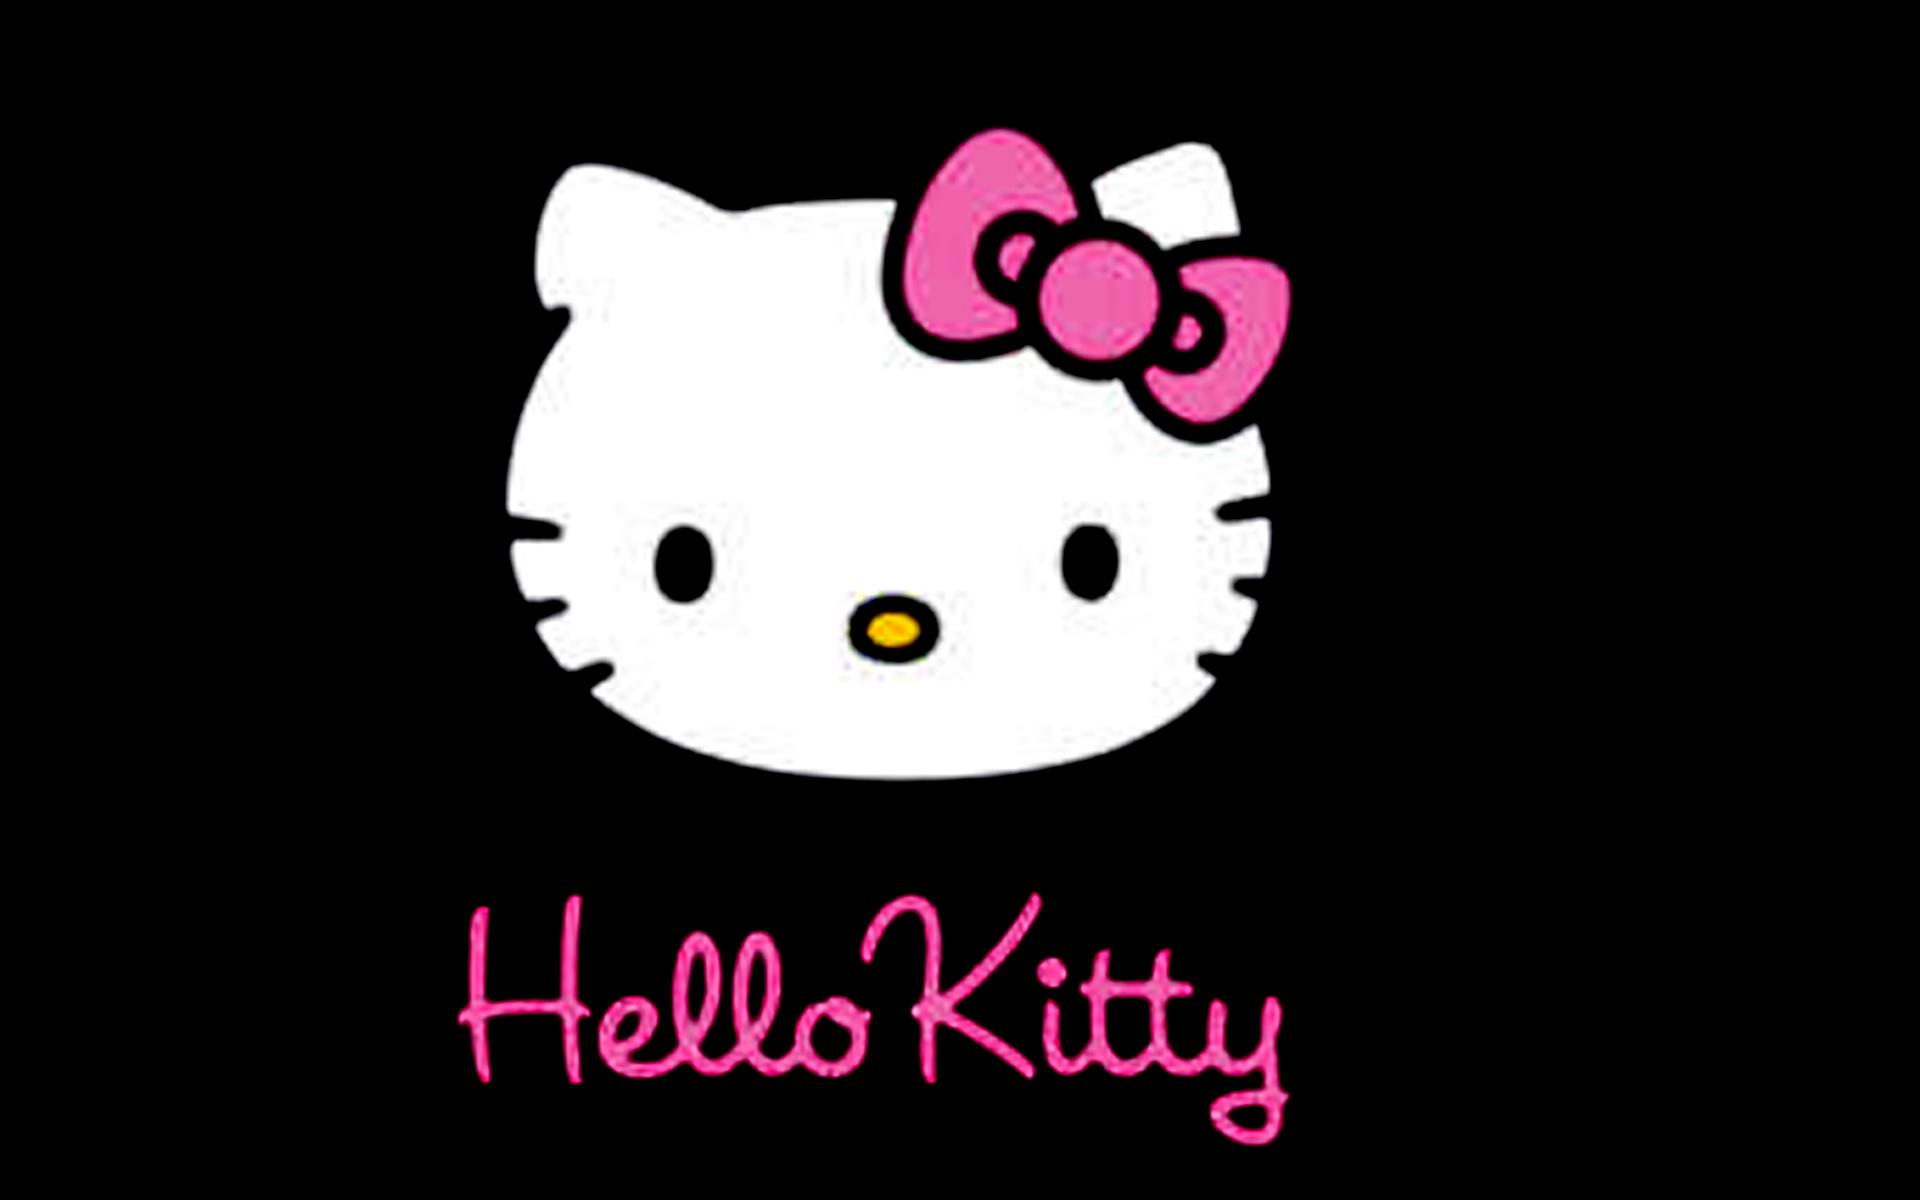 hello kitty black backgrounds hd wallpaper background desktop